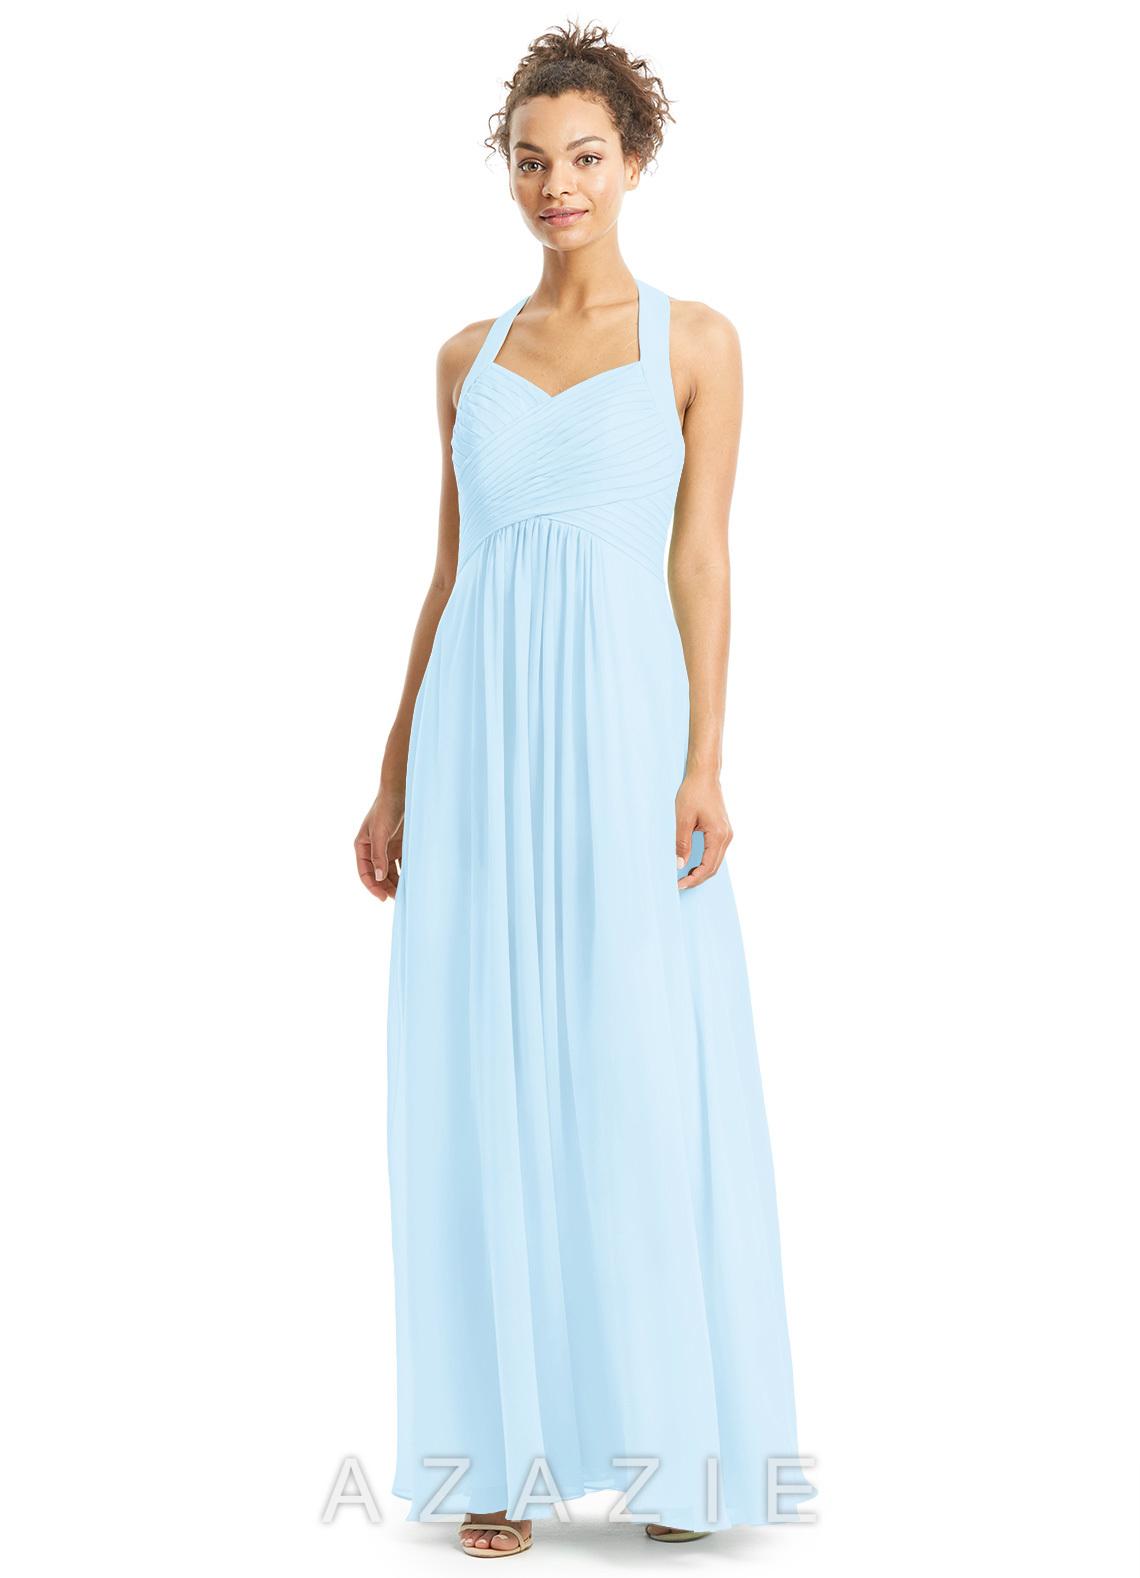 Azazie Savannah Bridesmaid Dress | Azazie - photo #21